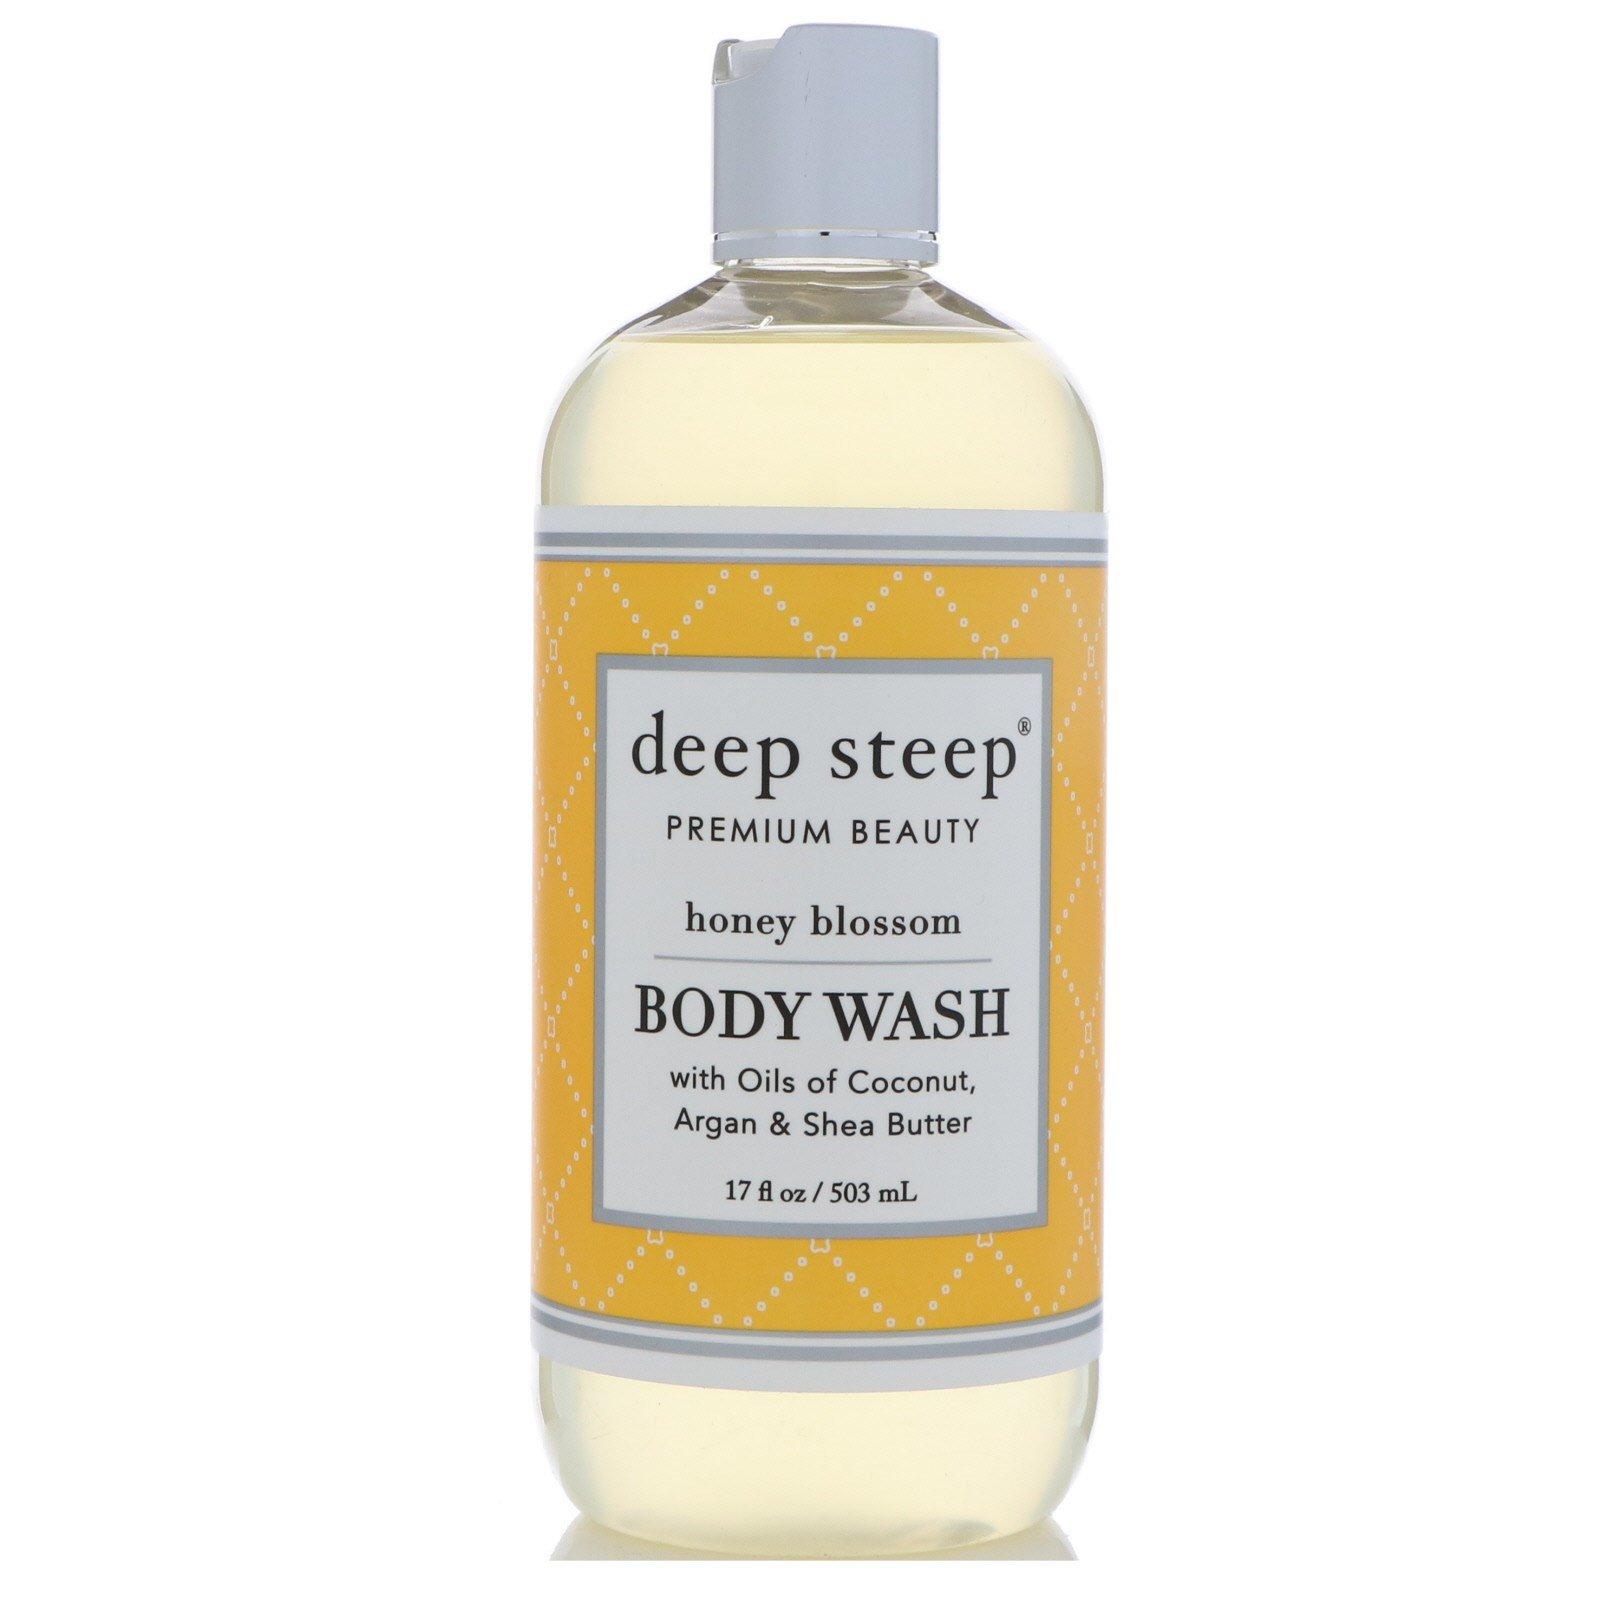 Deep Steep, Body Wash, Honey Blossom, 17 fl oz (503 ml)